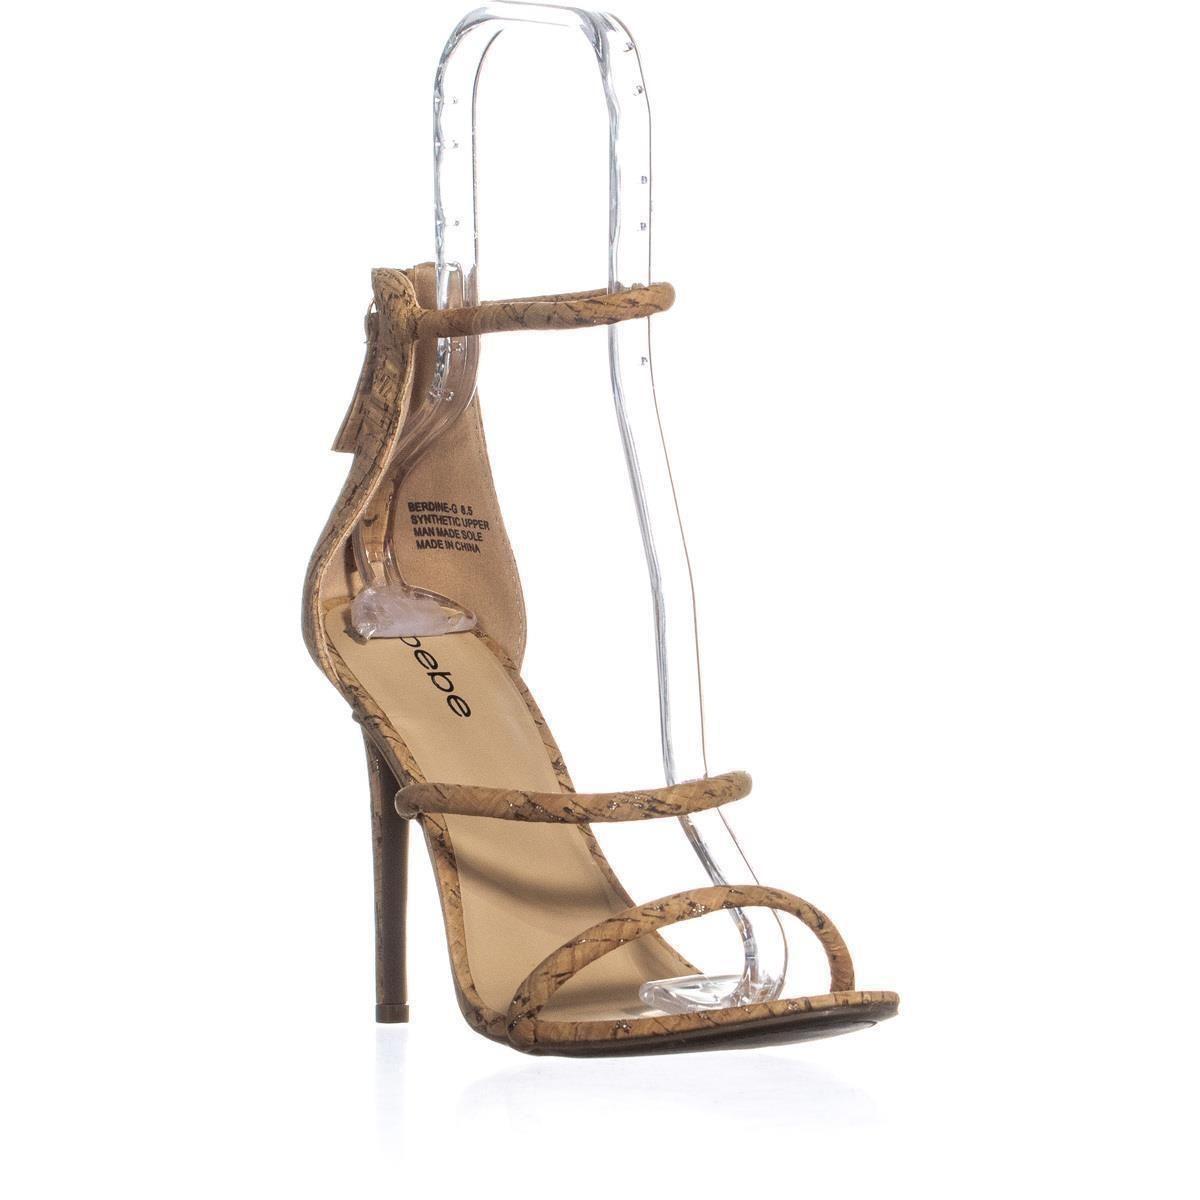 eb059b9f177 Lyst - Bebe Berdine Strappy Dress Sandals in Metallic